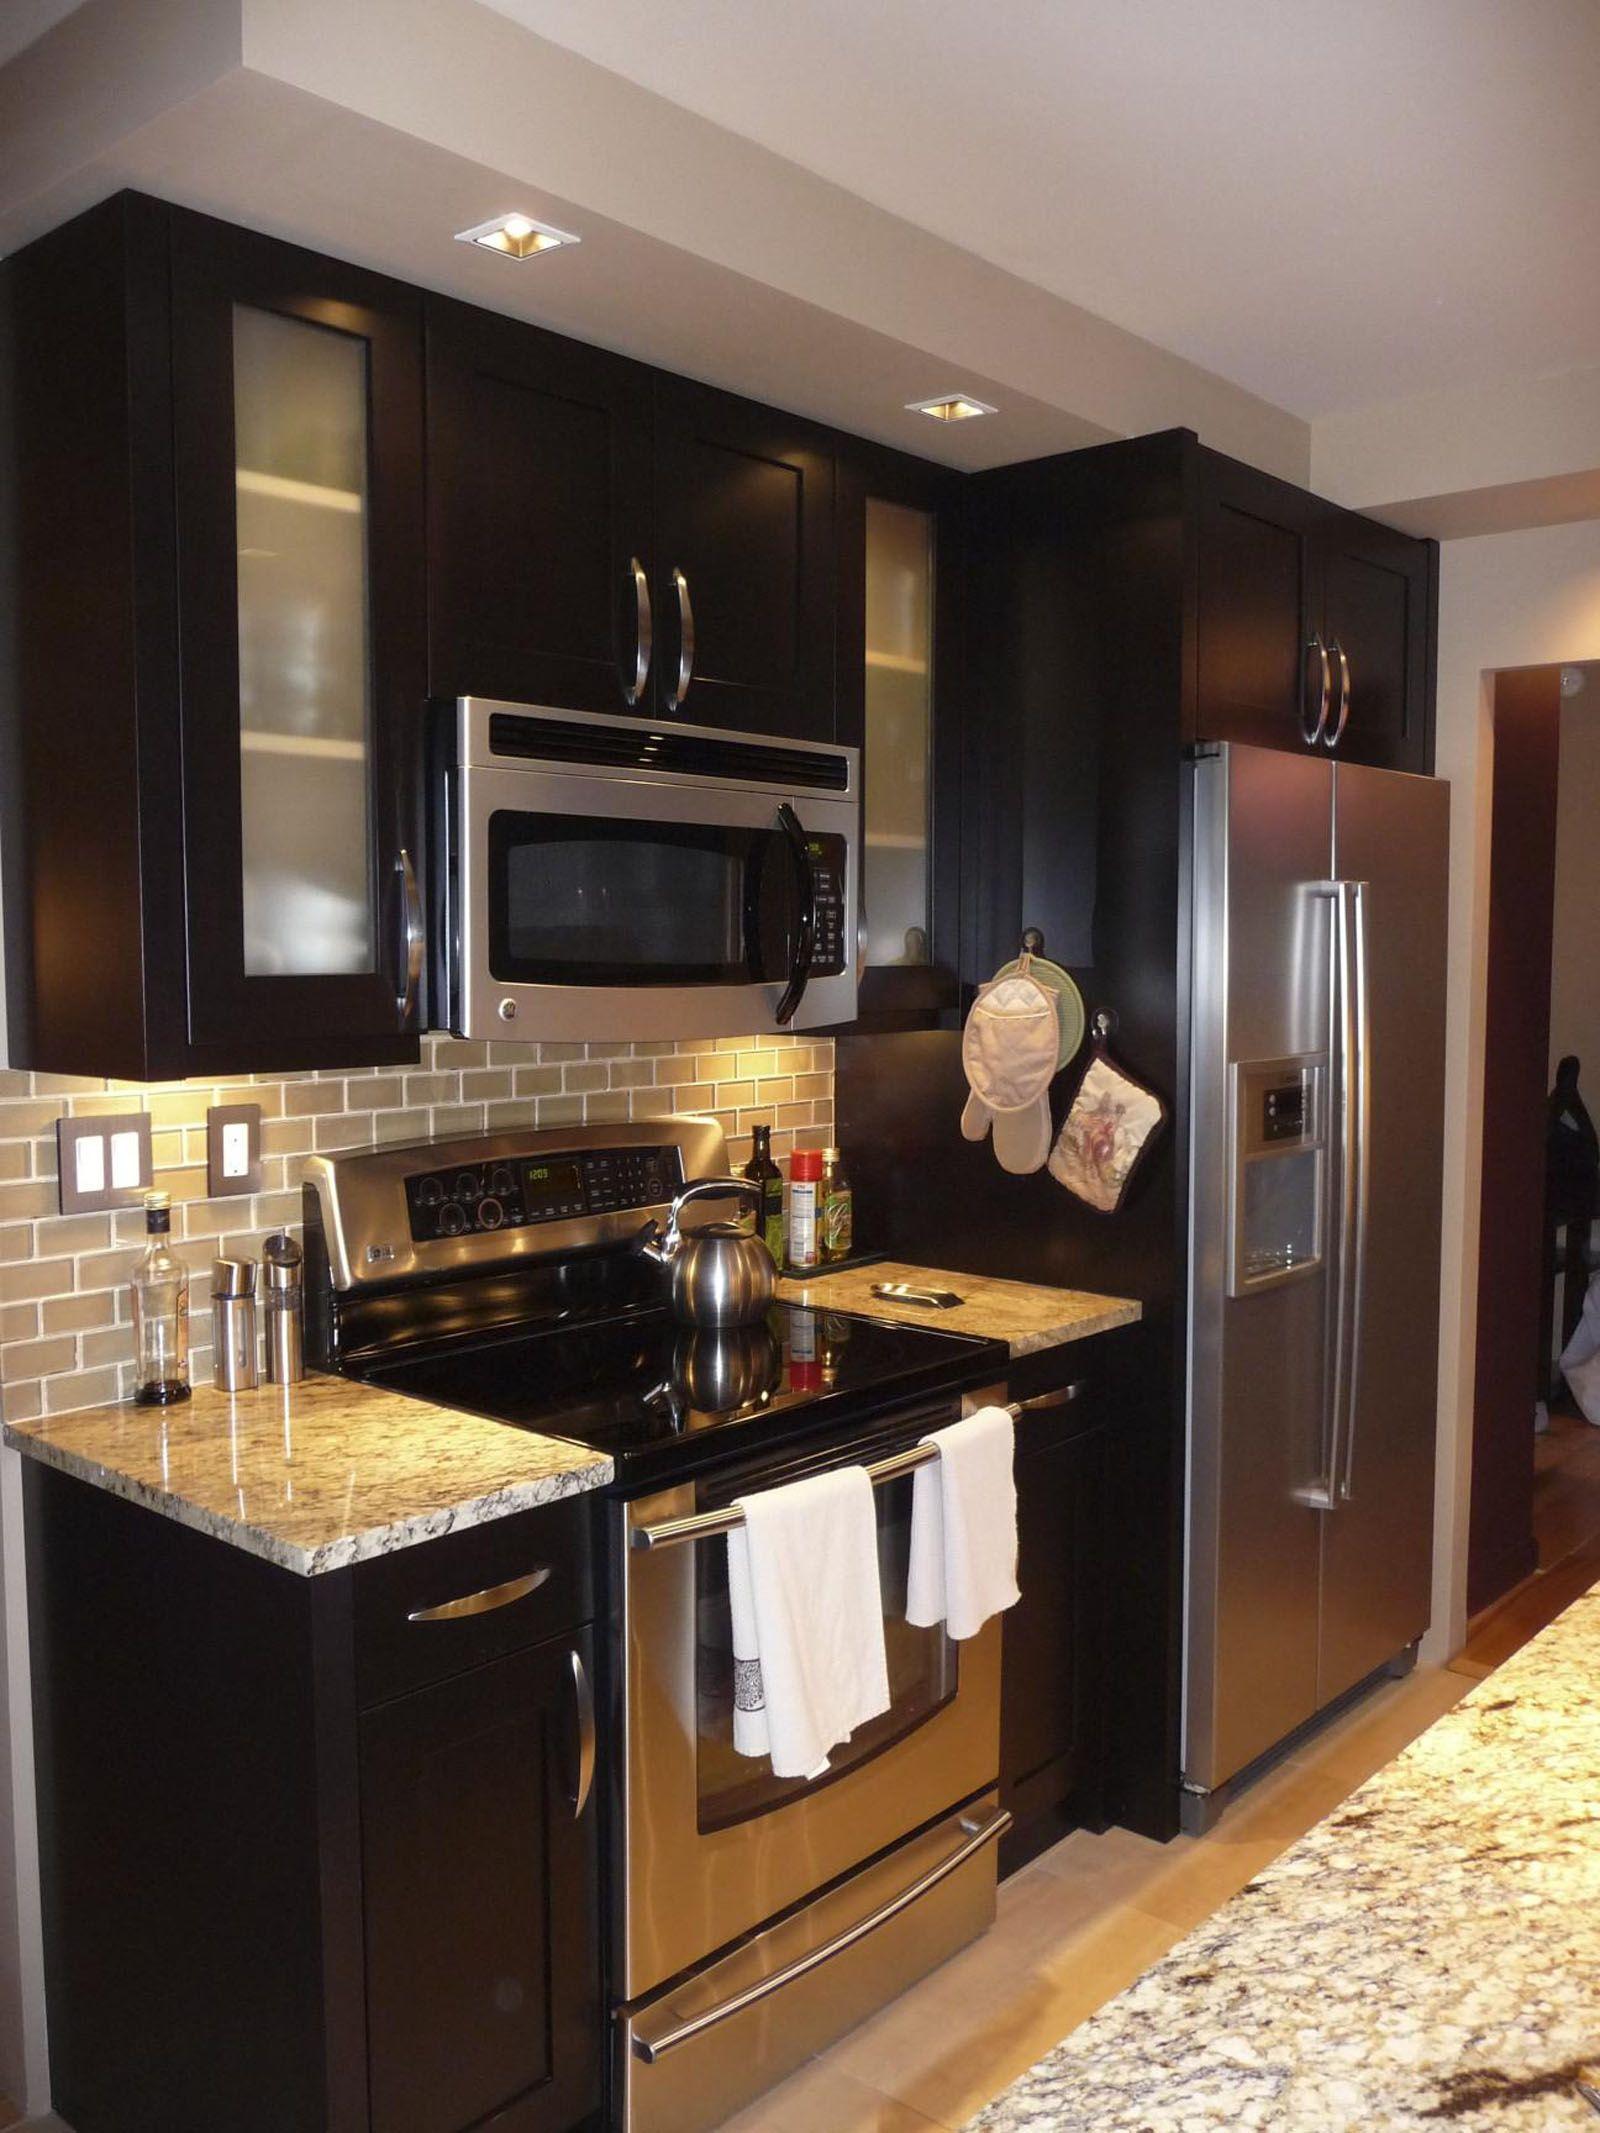 Small Kitchen Design For Apartments Orginally Modern Small Kitchen Design Ideas Home Decoratin Small Modern Kitchens Kitchen Design Small Modern Kitchen Design